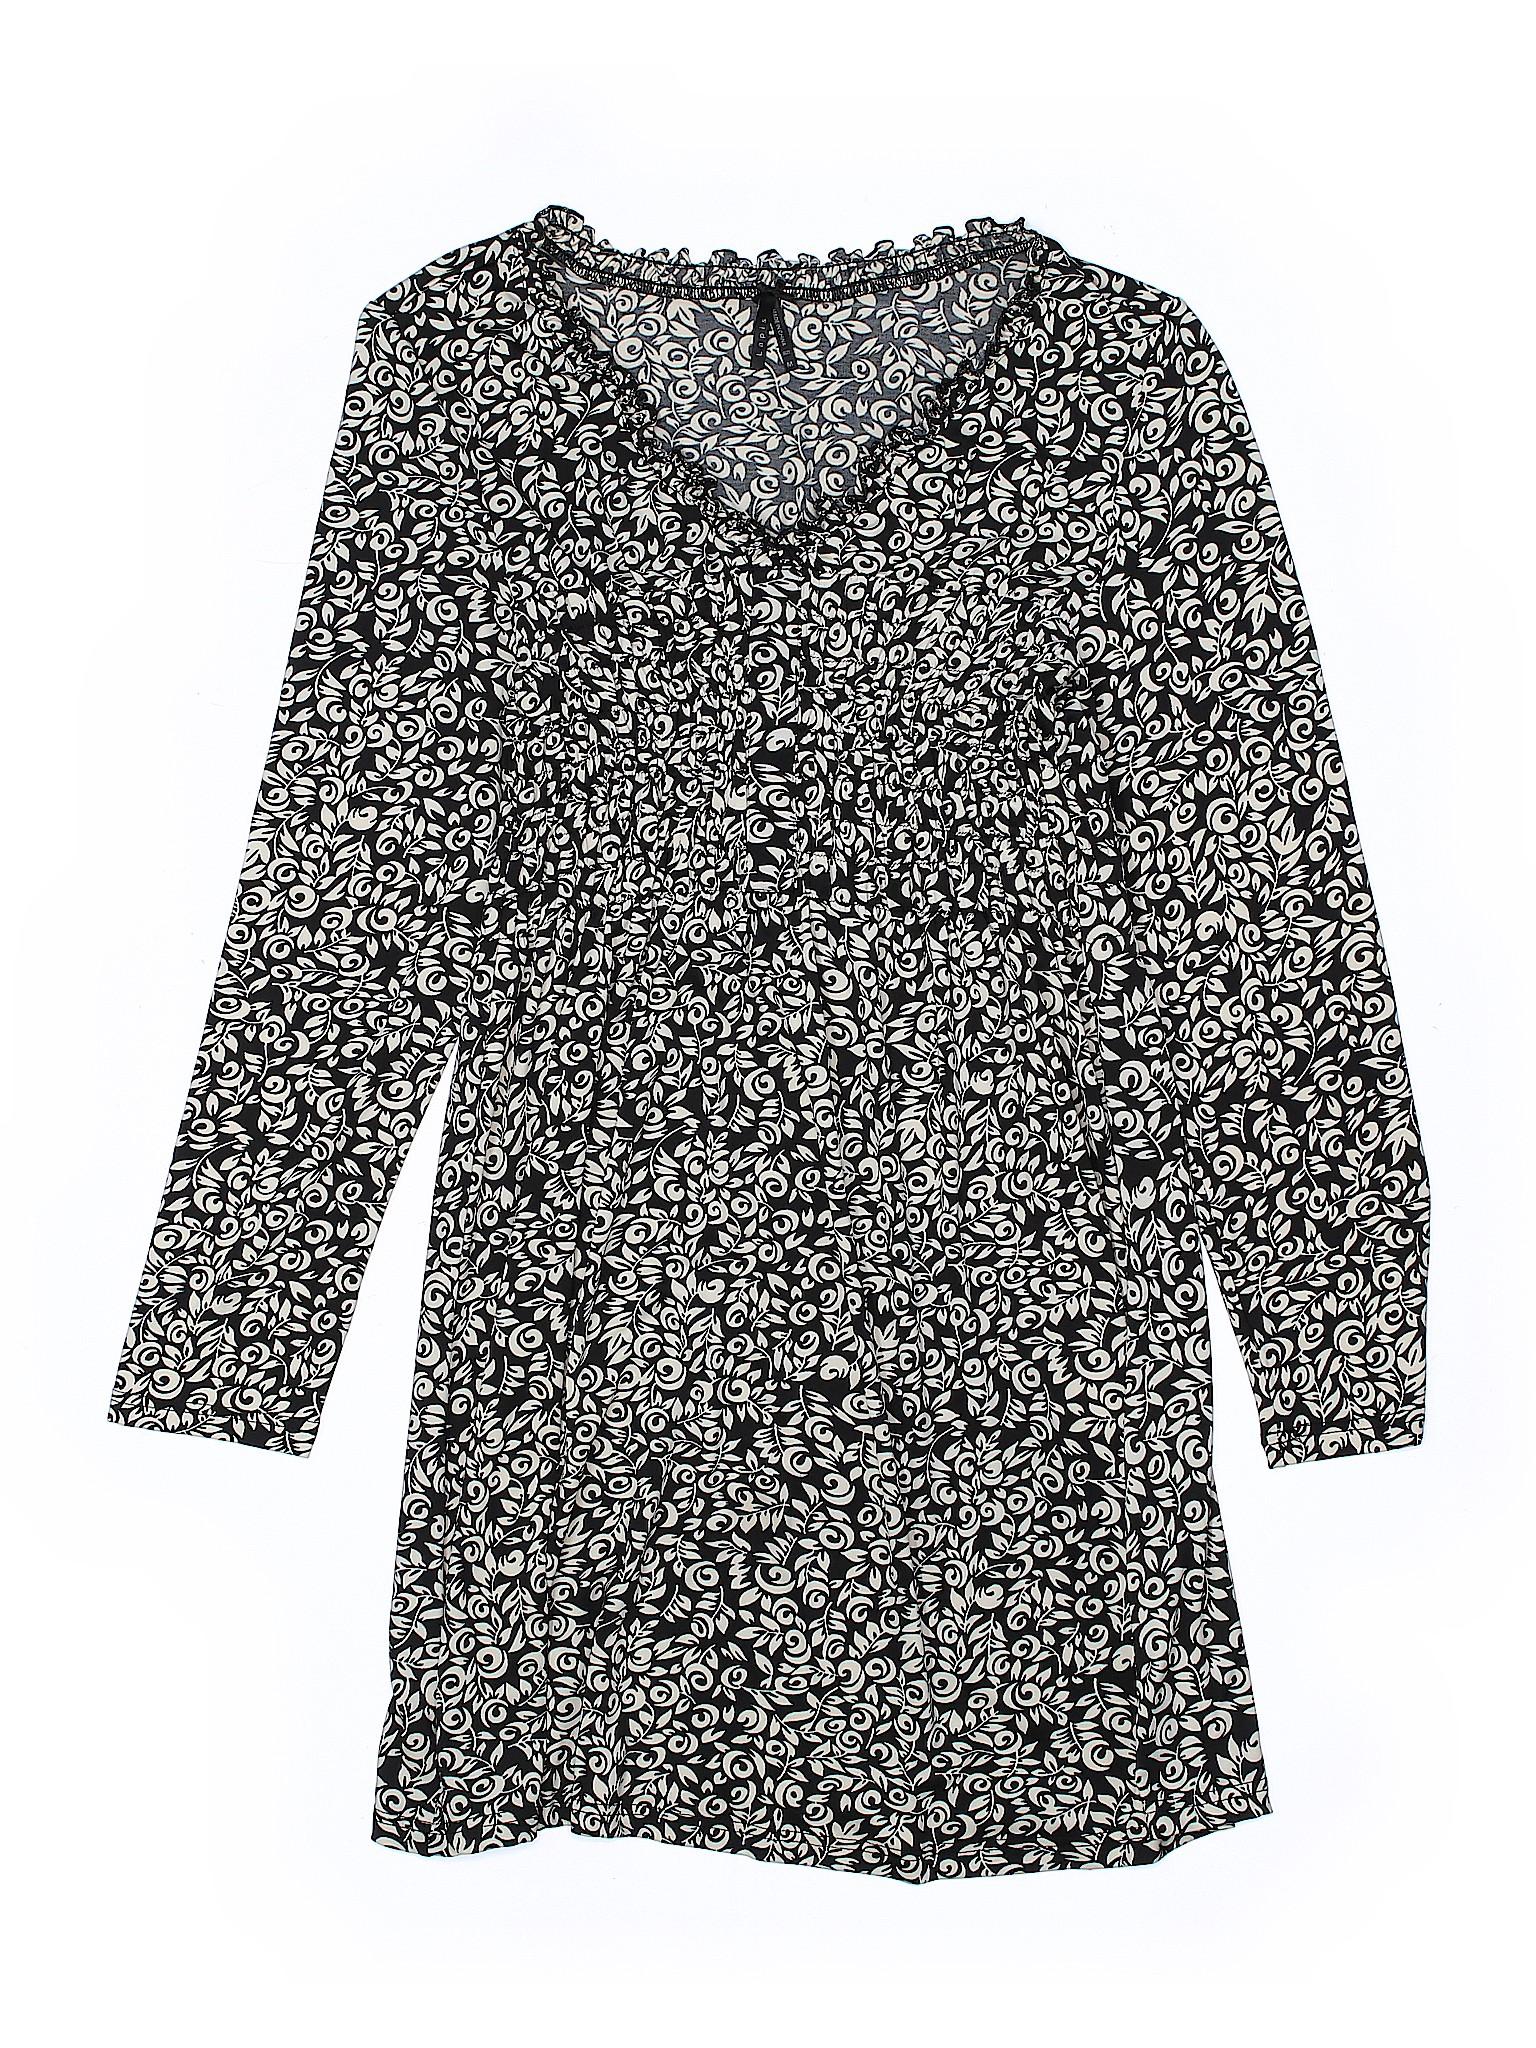 Lapis Selling Casual Selling Dress Casual Selling Lapis Dress Lapis UT1Tw